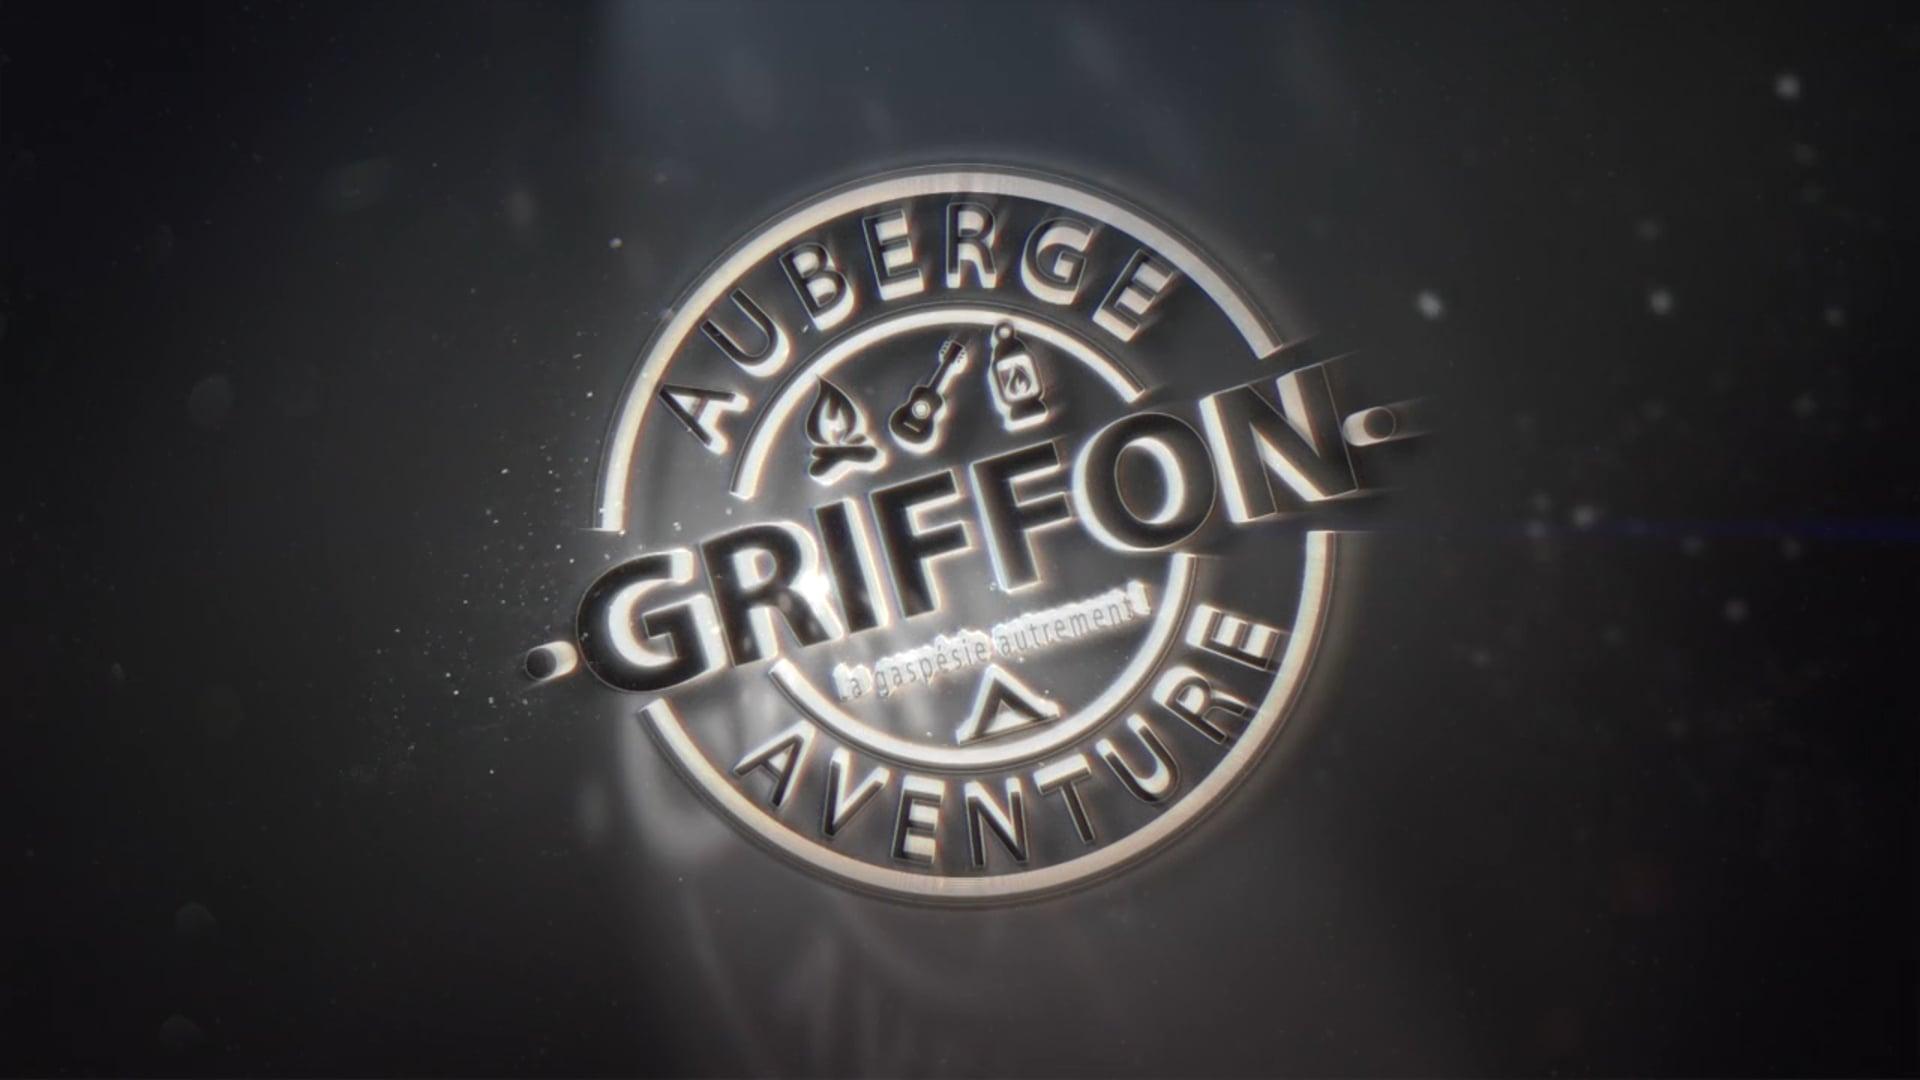 Auberge Griffon Aventure